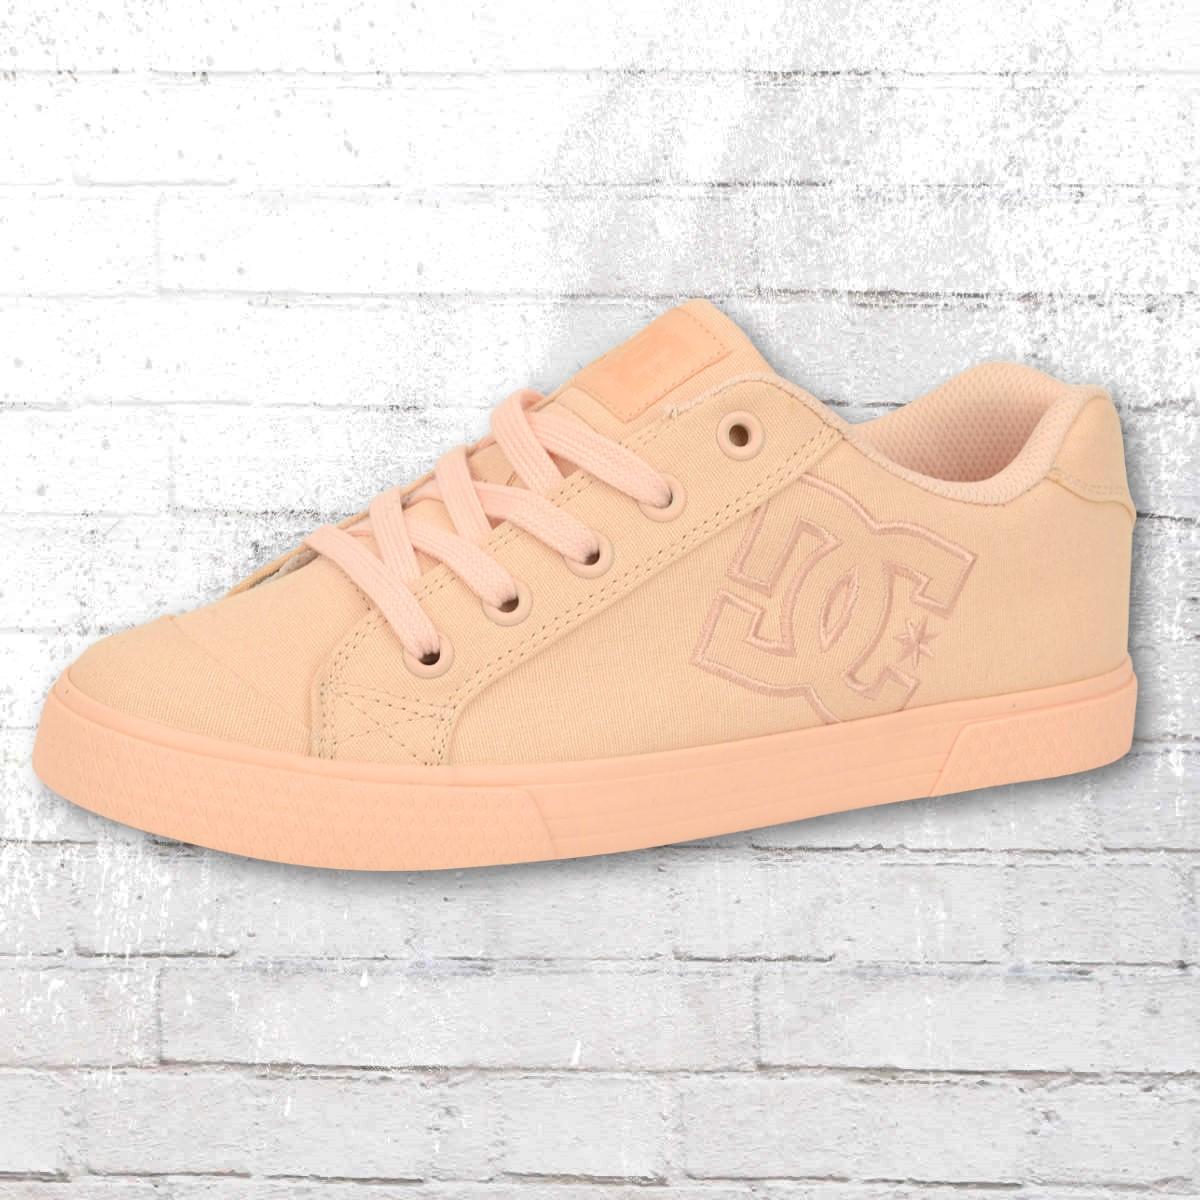 84002a60d DC Shoes Ladies Sneaker Chelsea peach cream. ›‹ «